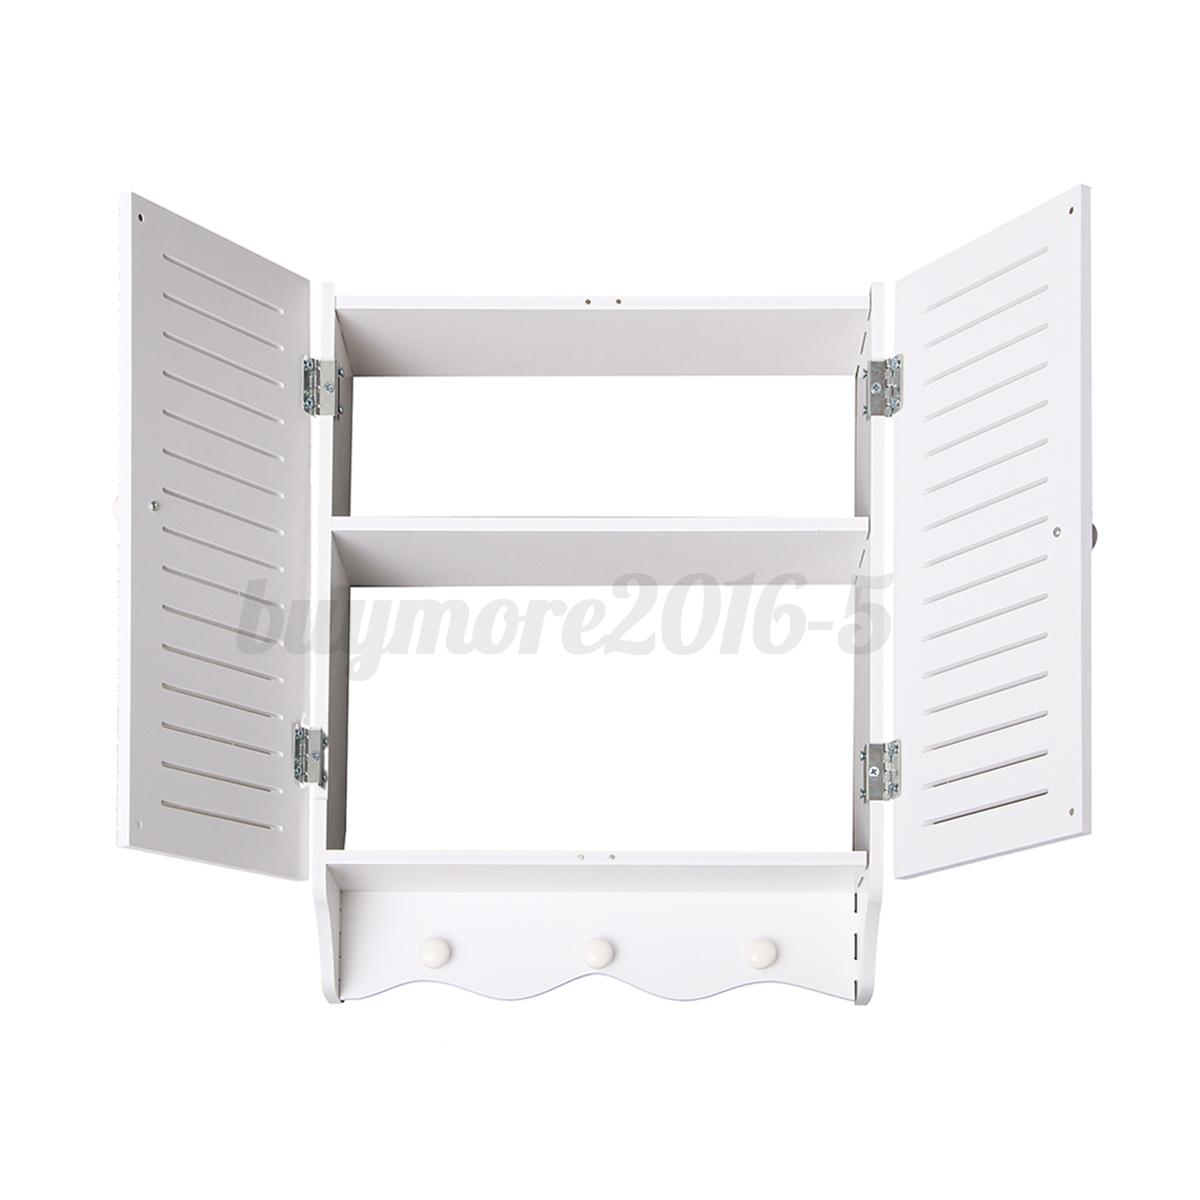 Bathroom cupboard cabinet wall mounted double shutter door for File f bathroom